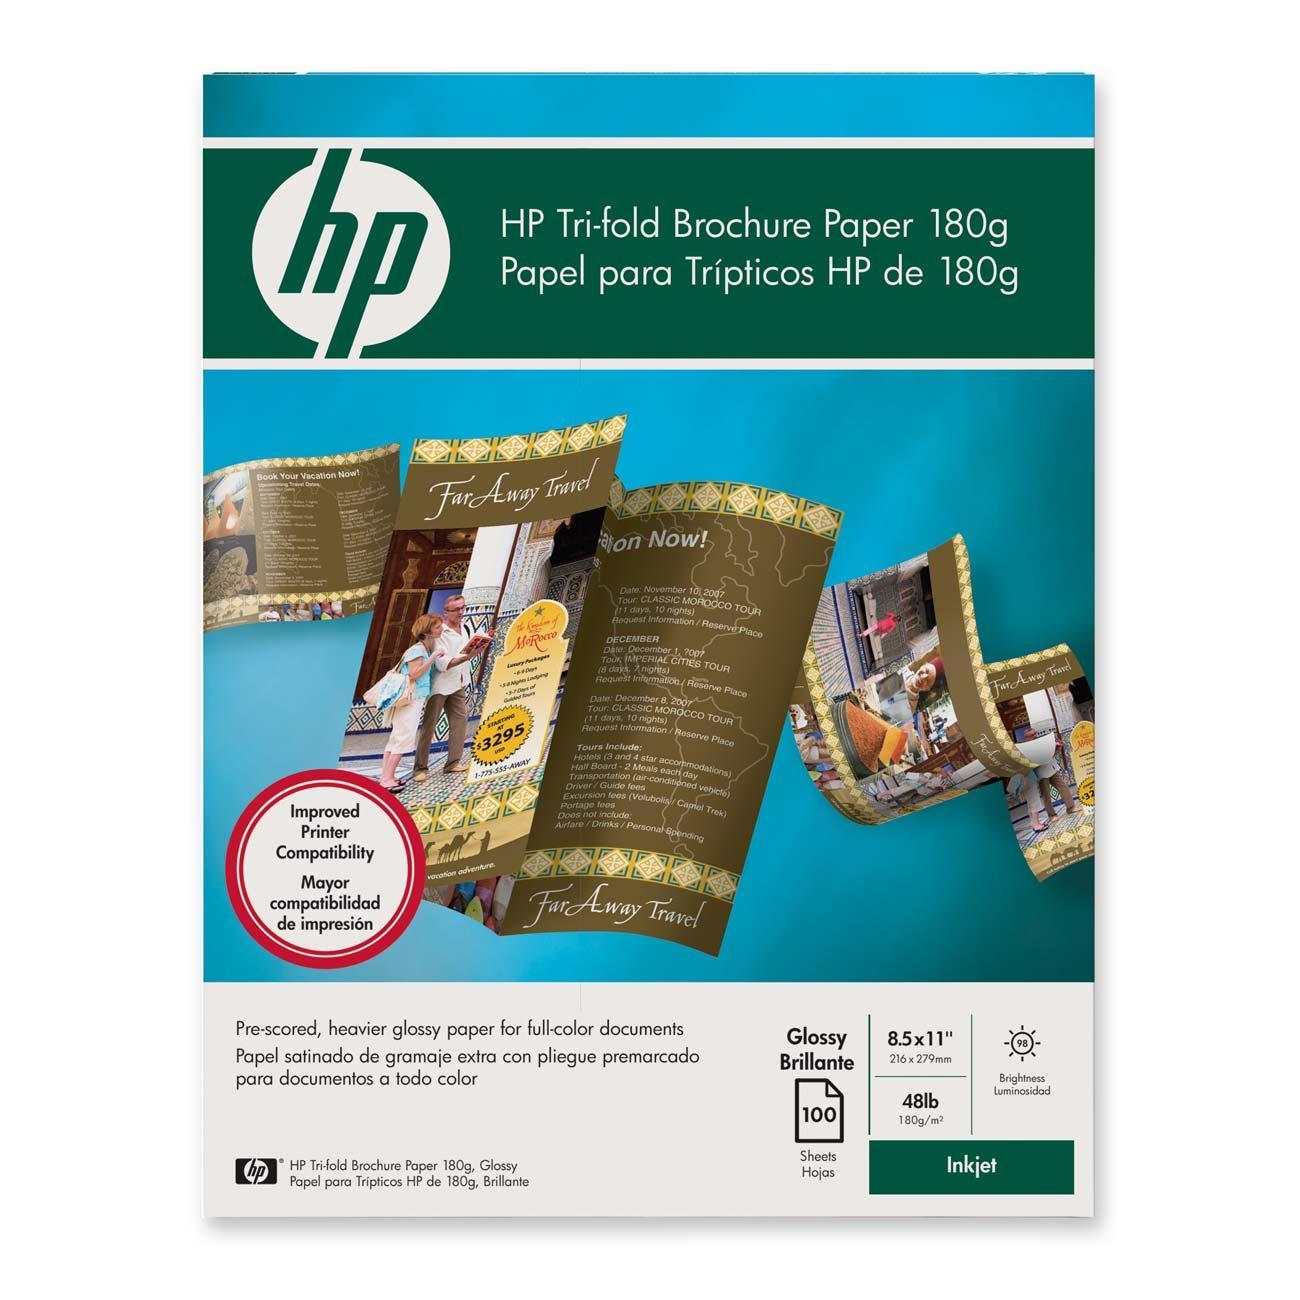 HP Trifold Brochure Paper CA HEWCA - Hp brochure templates